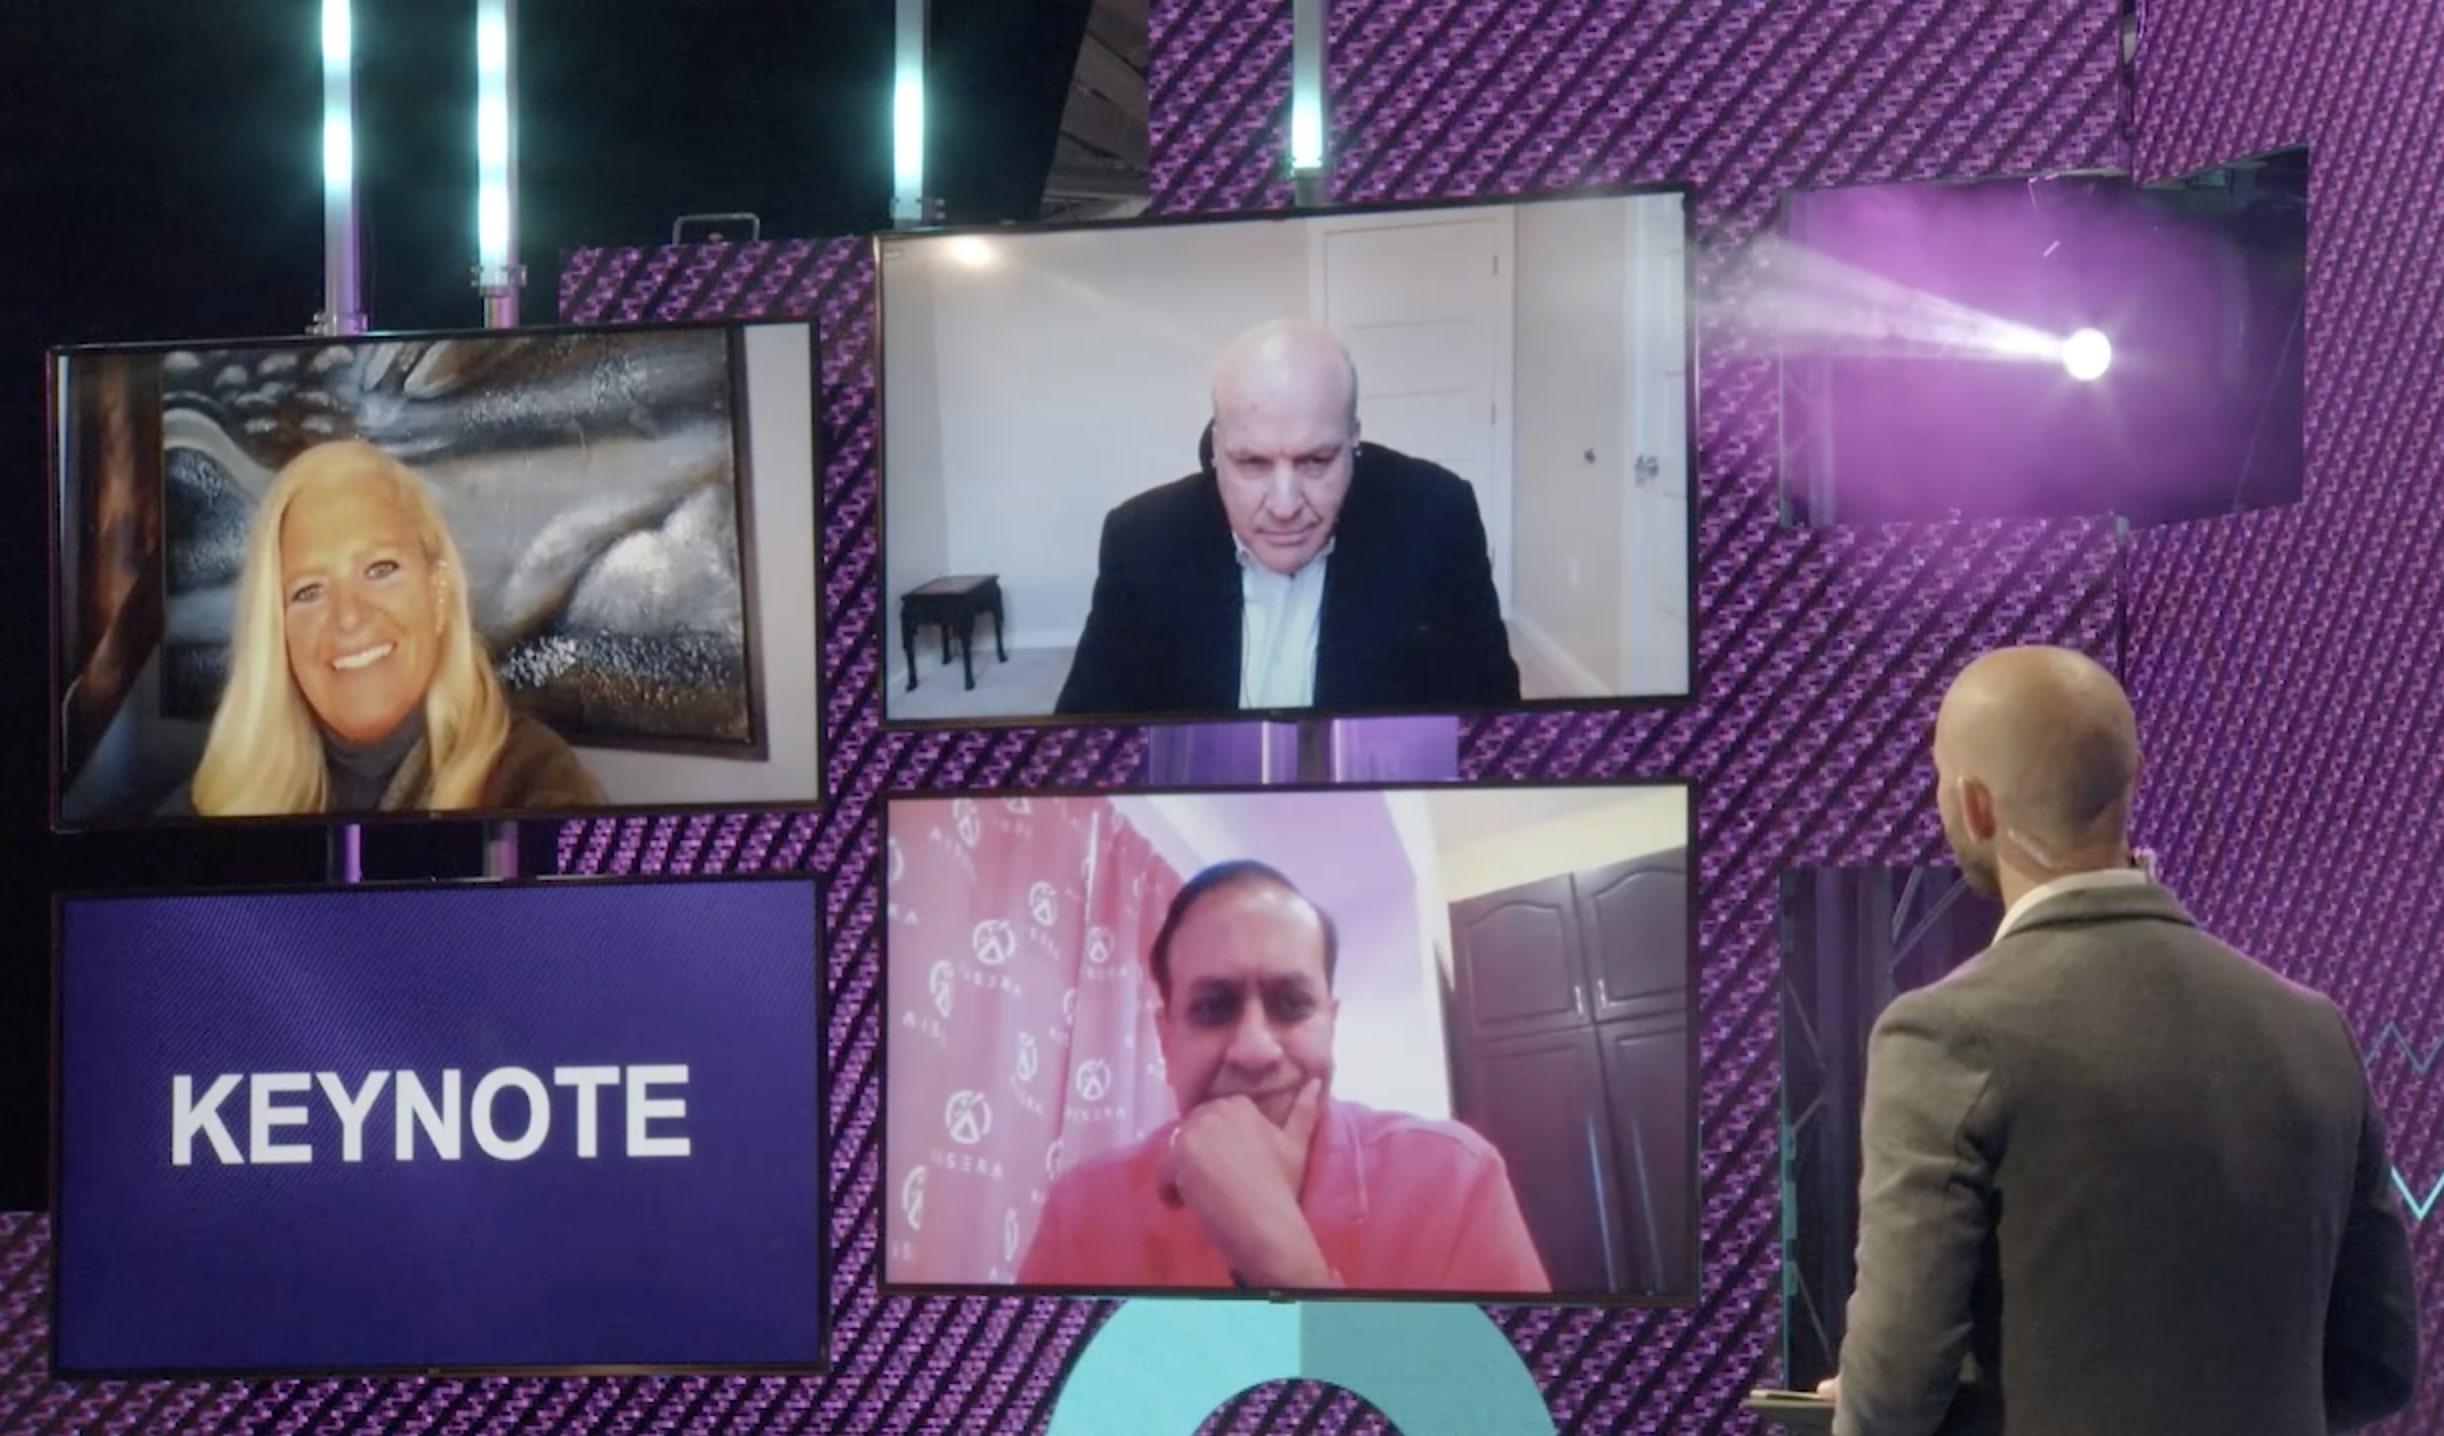 Dara Meath, Conair, Pete Gibson, Friendly's, Muddu Sudhaka, Aisera - The Customer and the role of the CIO